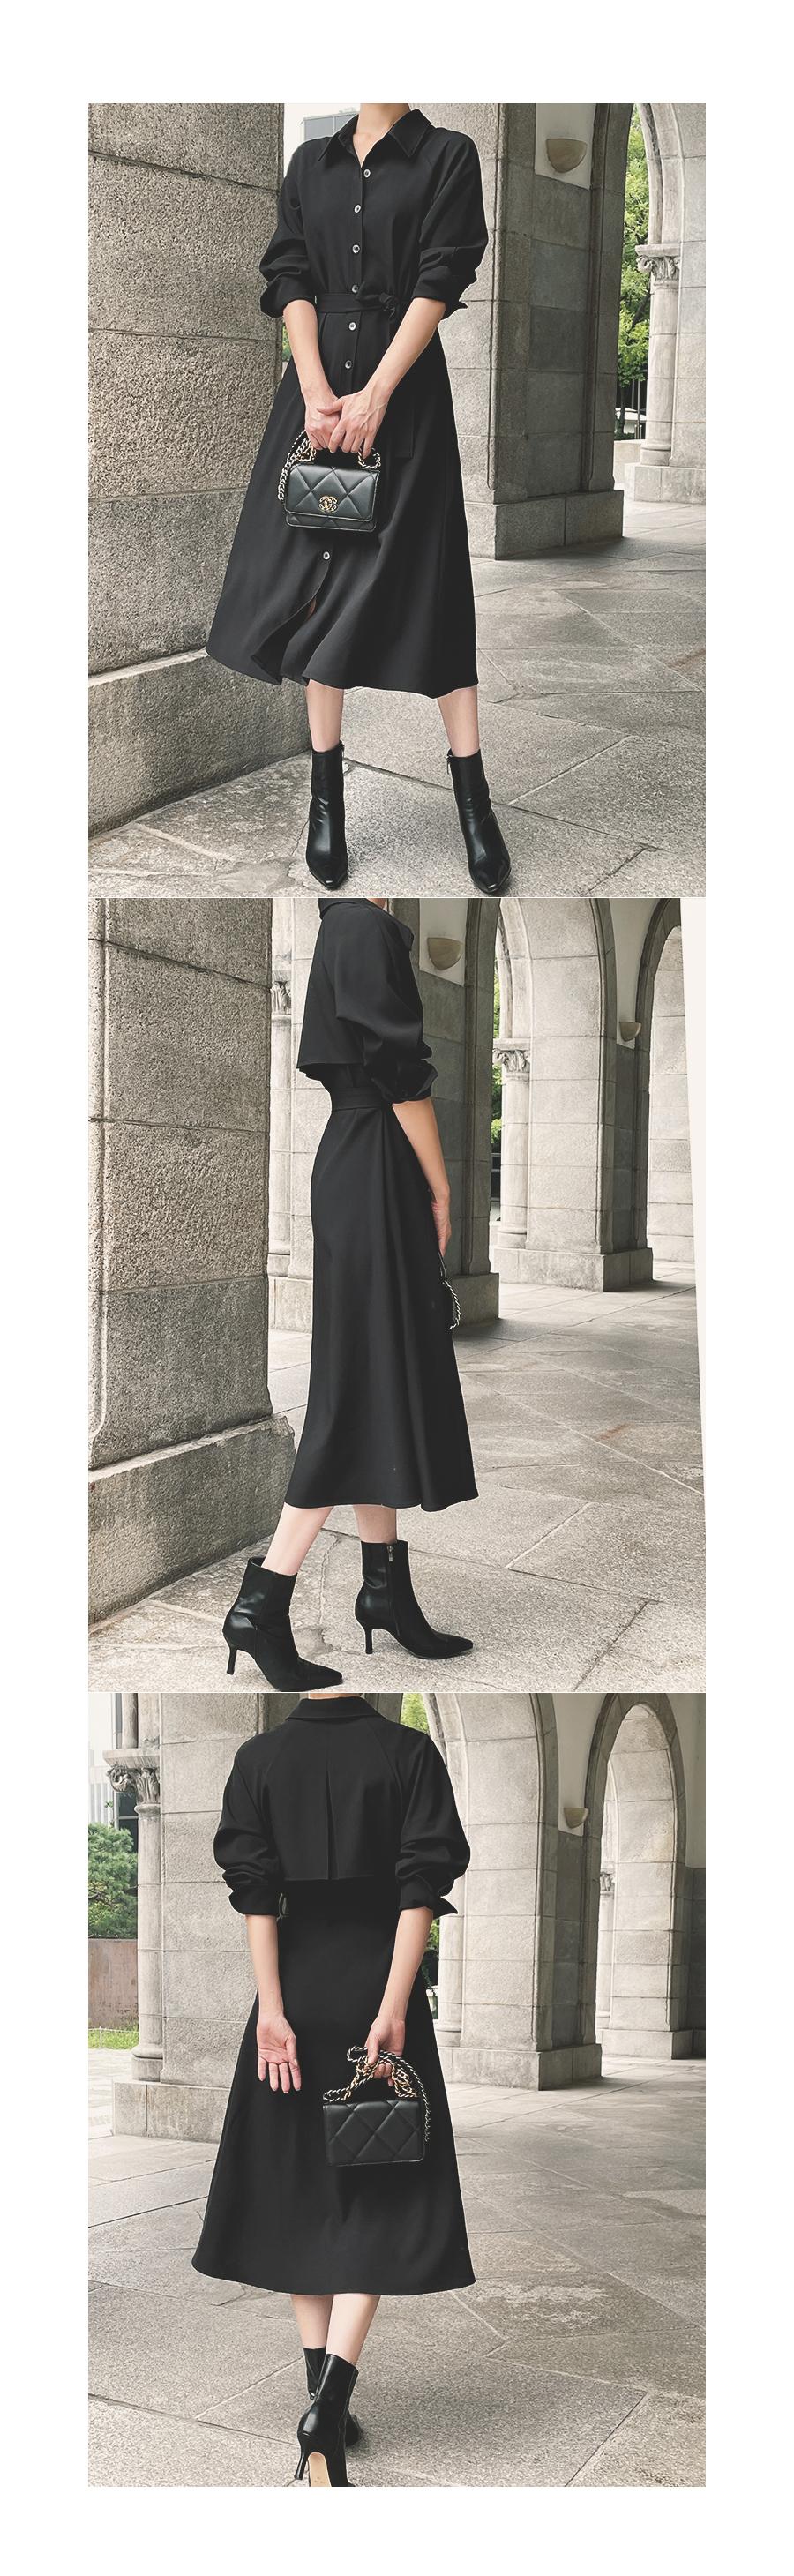 long dress model image-S11L8